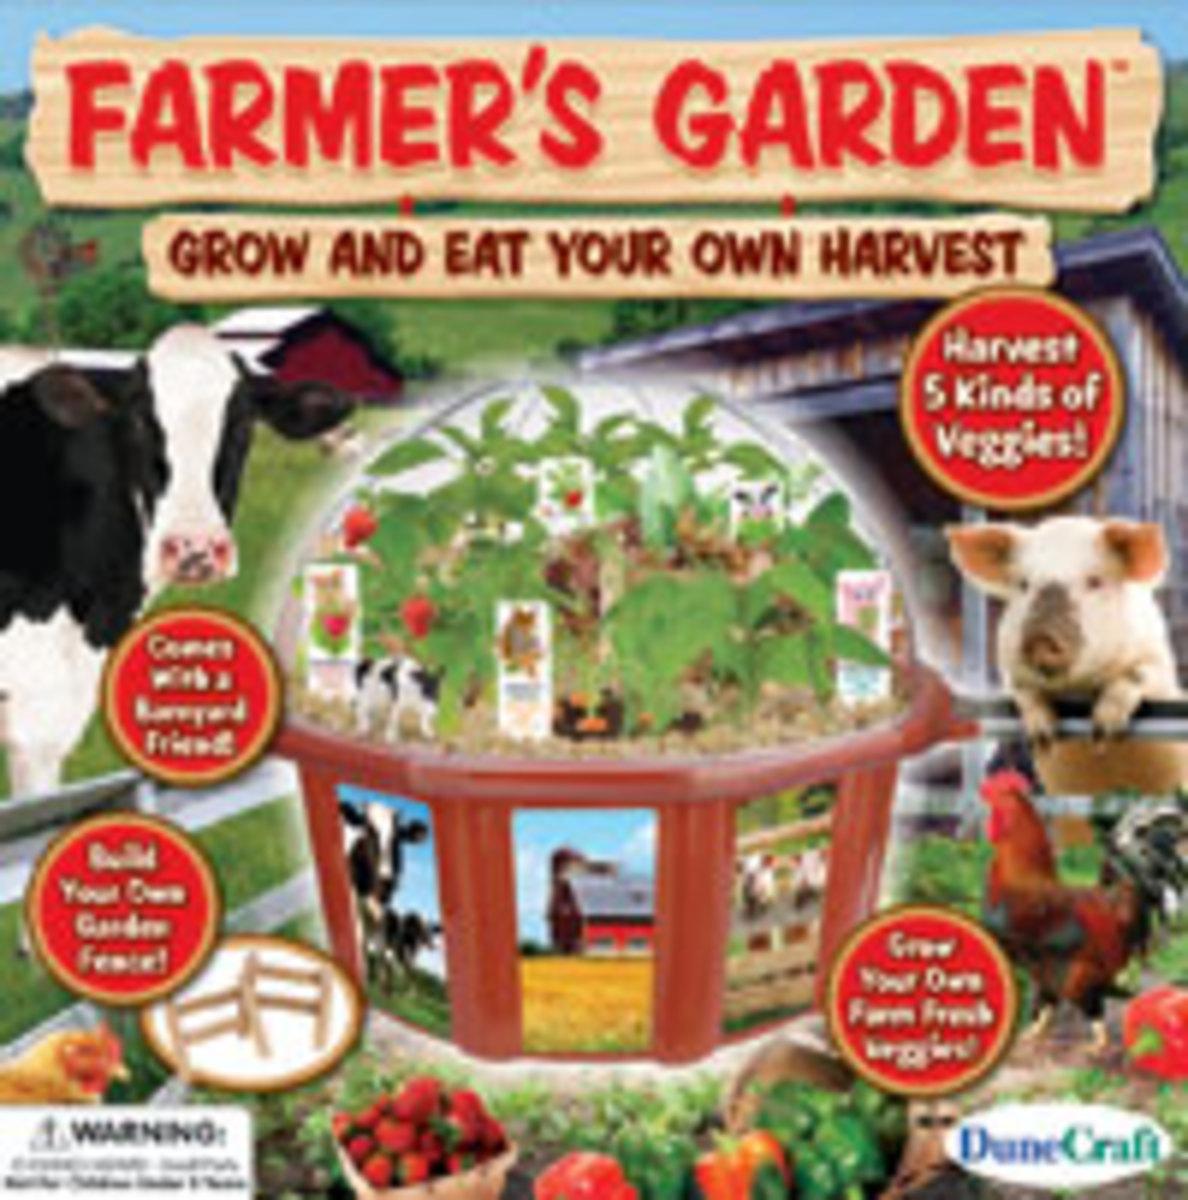 FarmersGarden